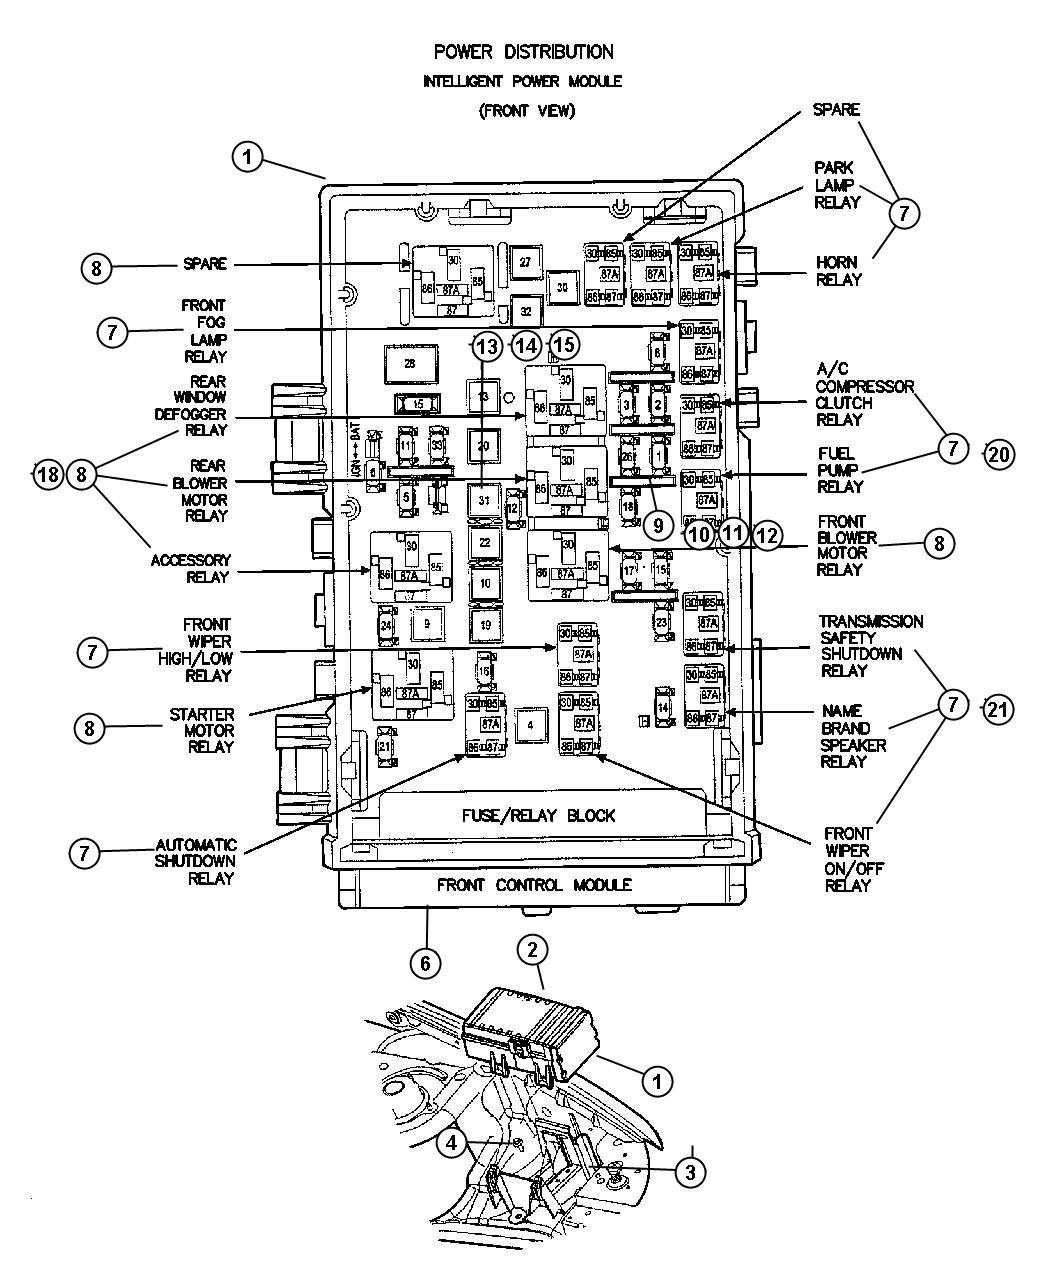 Dodge Nitro Cover Power Distribution Center Infinityfog